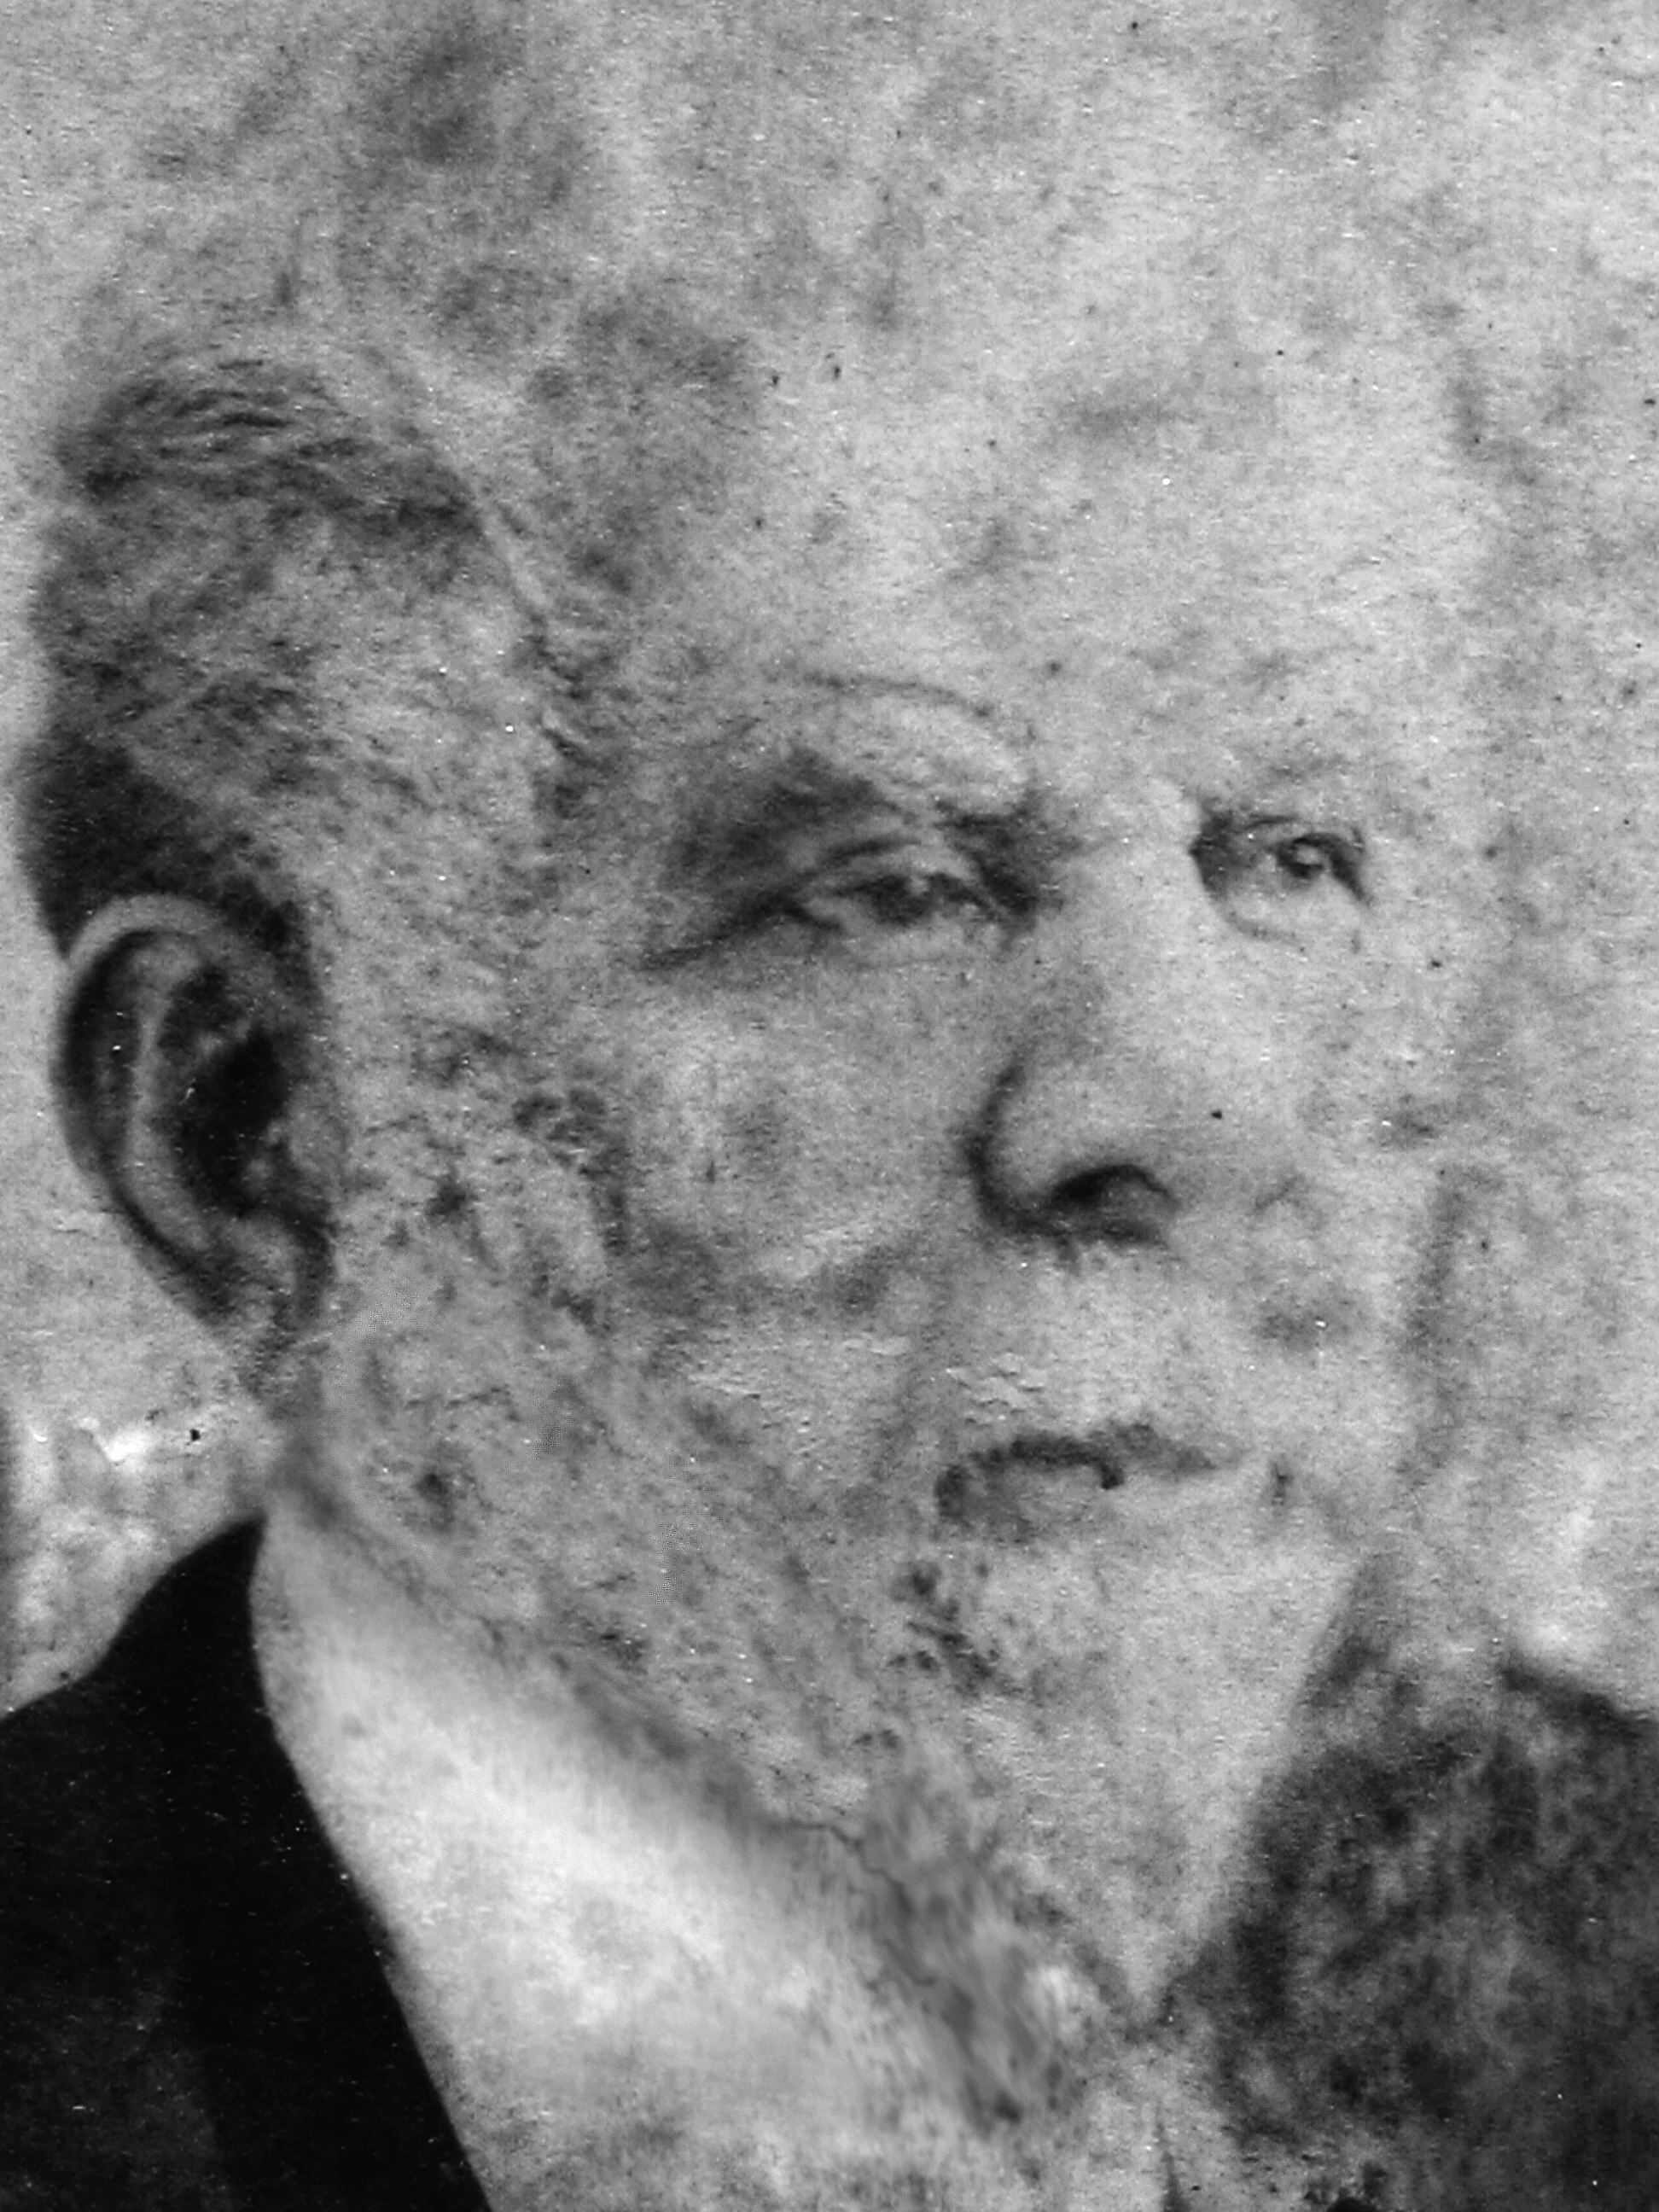 FileCarte De Visite Photograph Of Pio Pico Age 72 In 1873